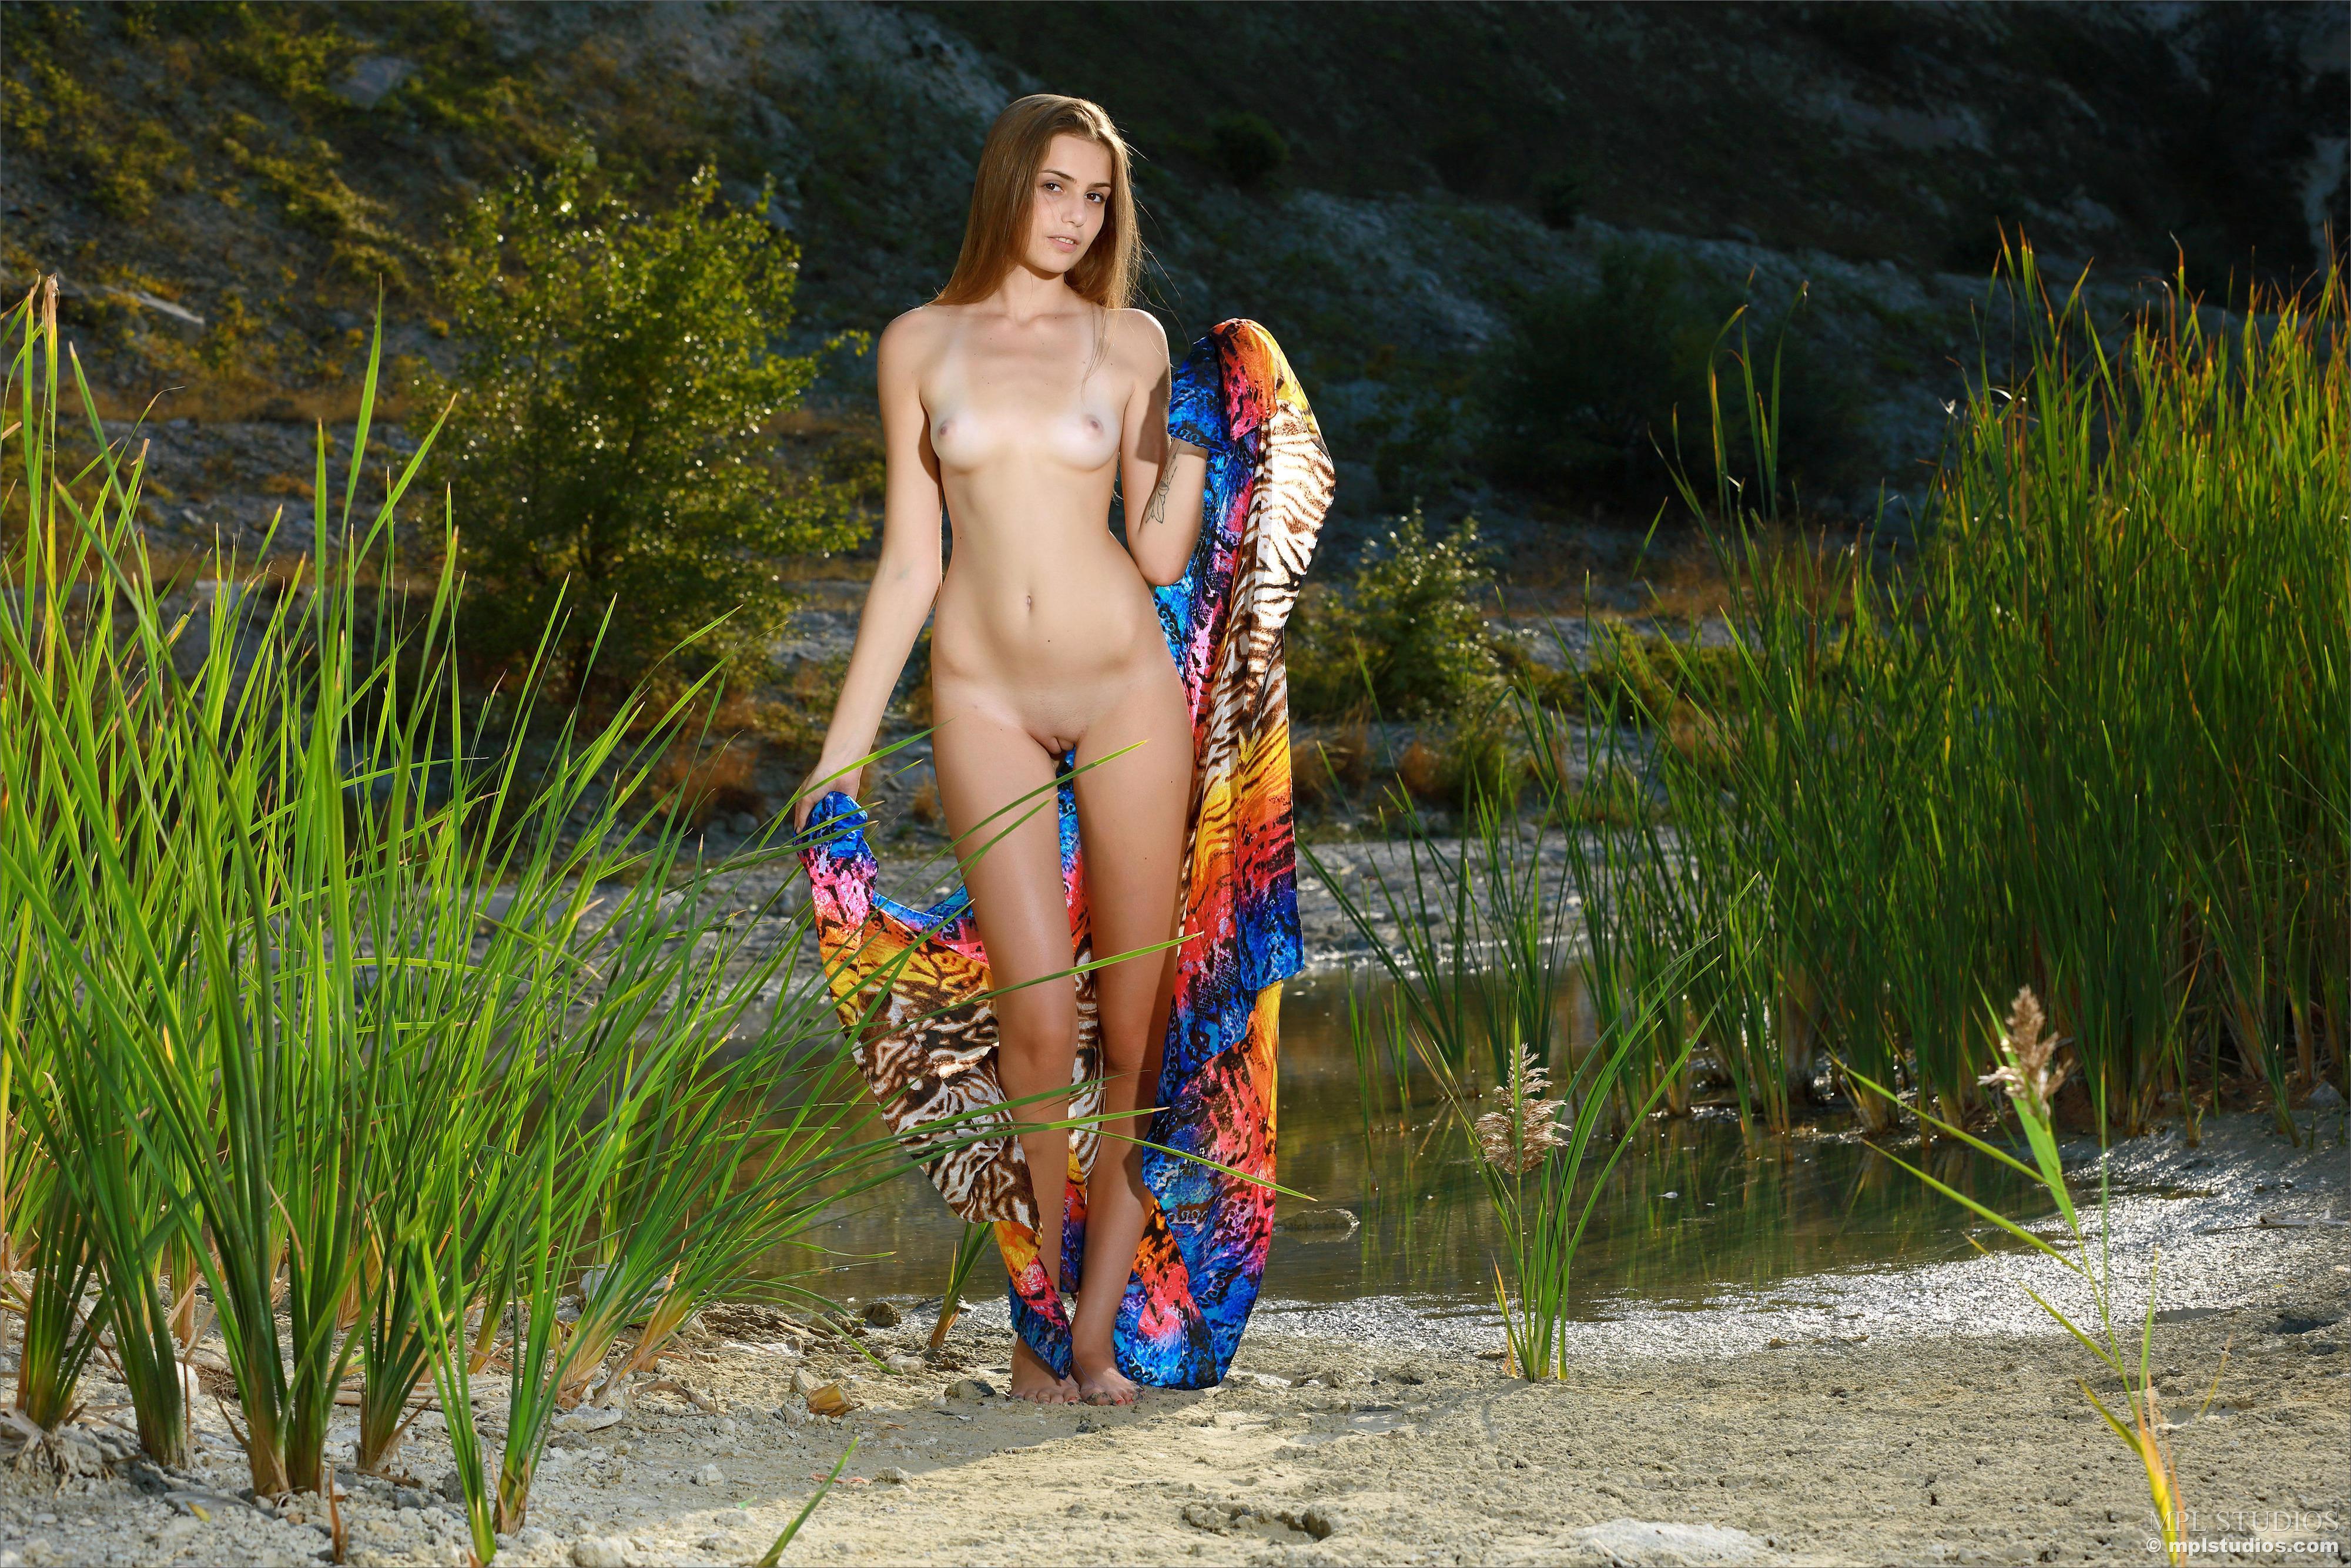 обои Elle, красотка, голая, голая девушка картинки фото